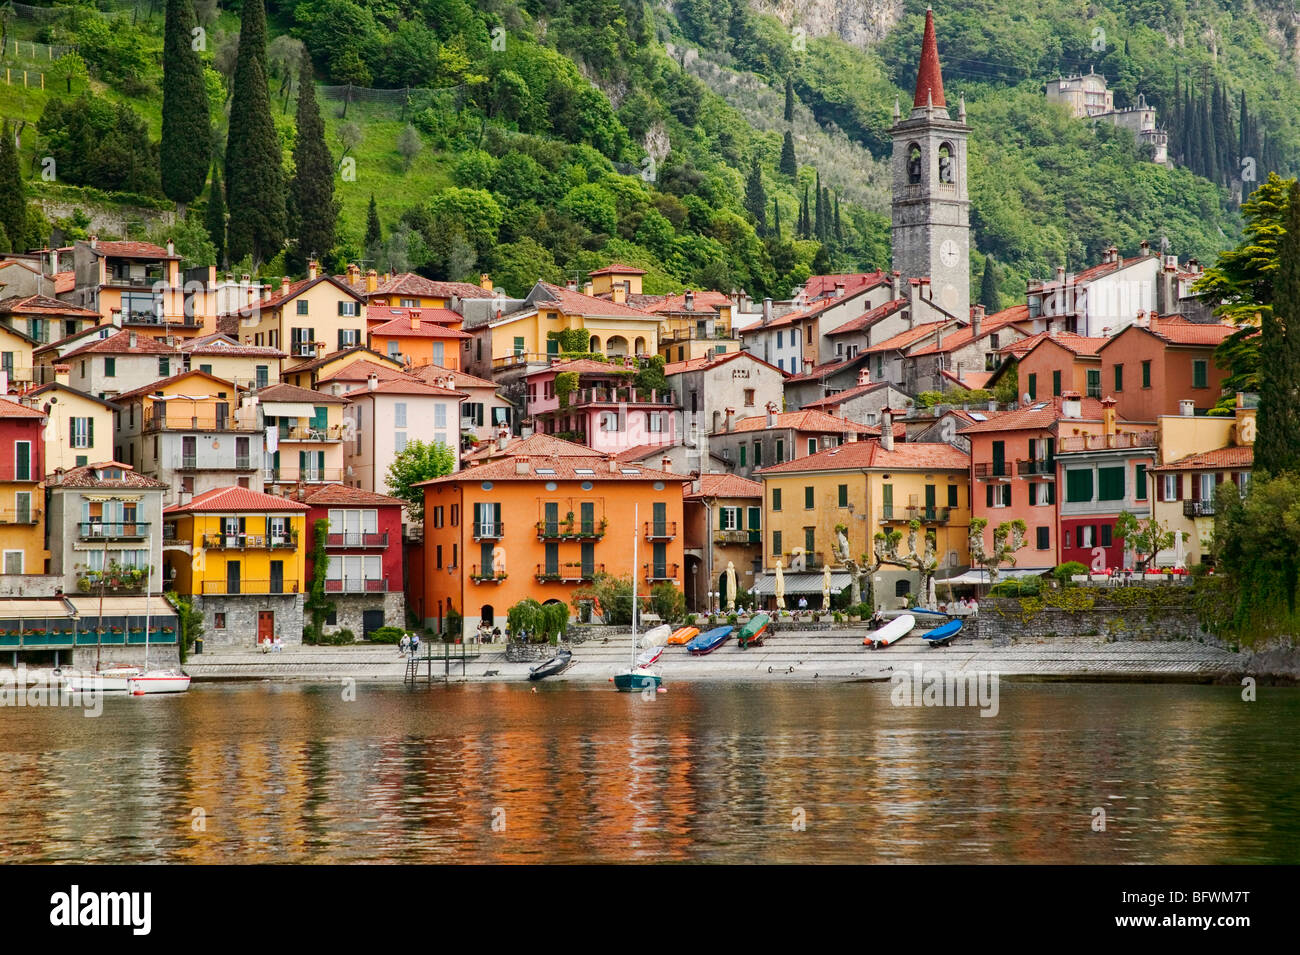 Varenna on the shores of Lago di Lecco, Lombardia, Italy. - Stock Image